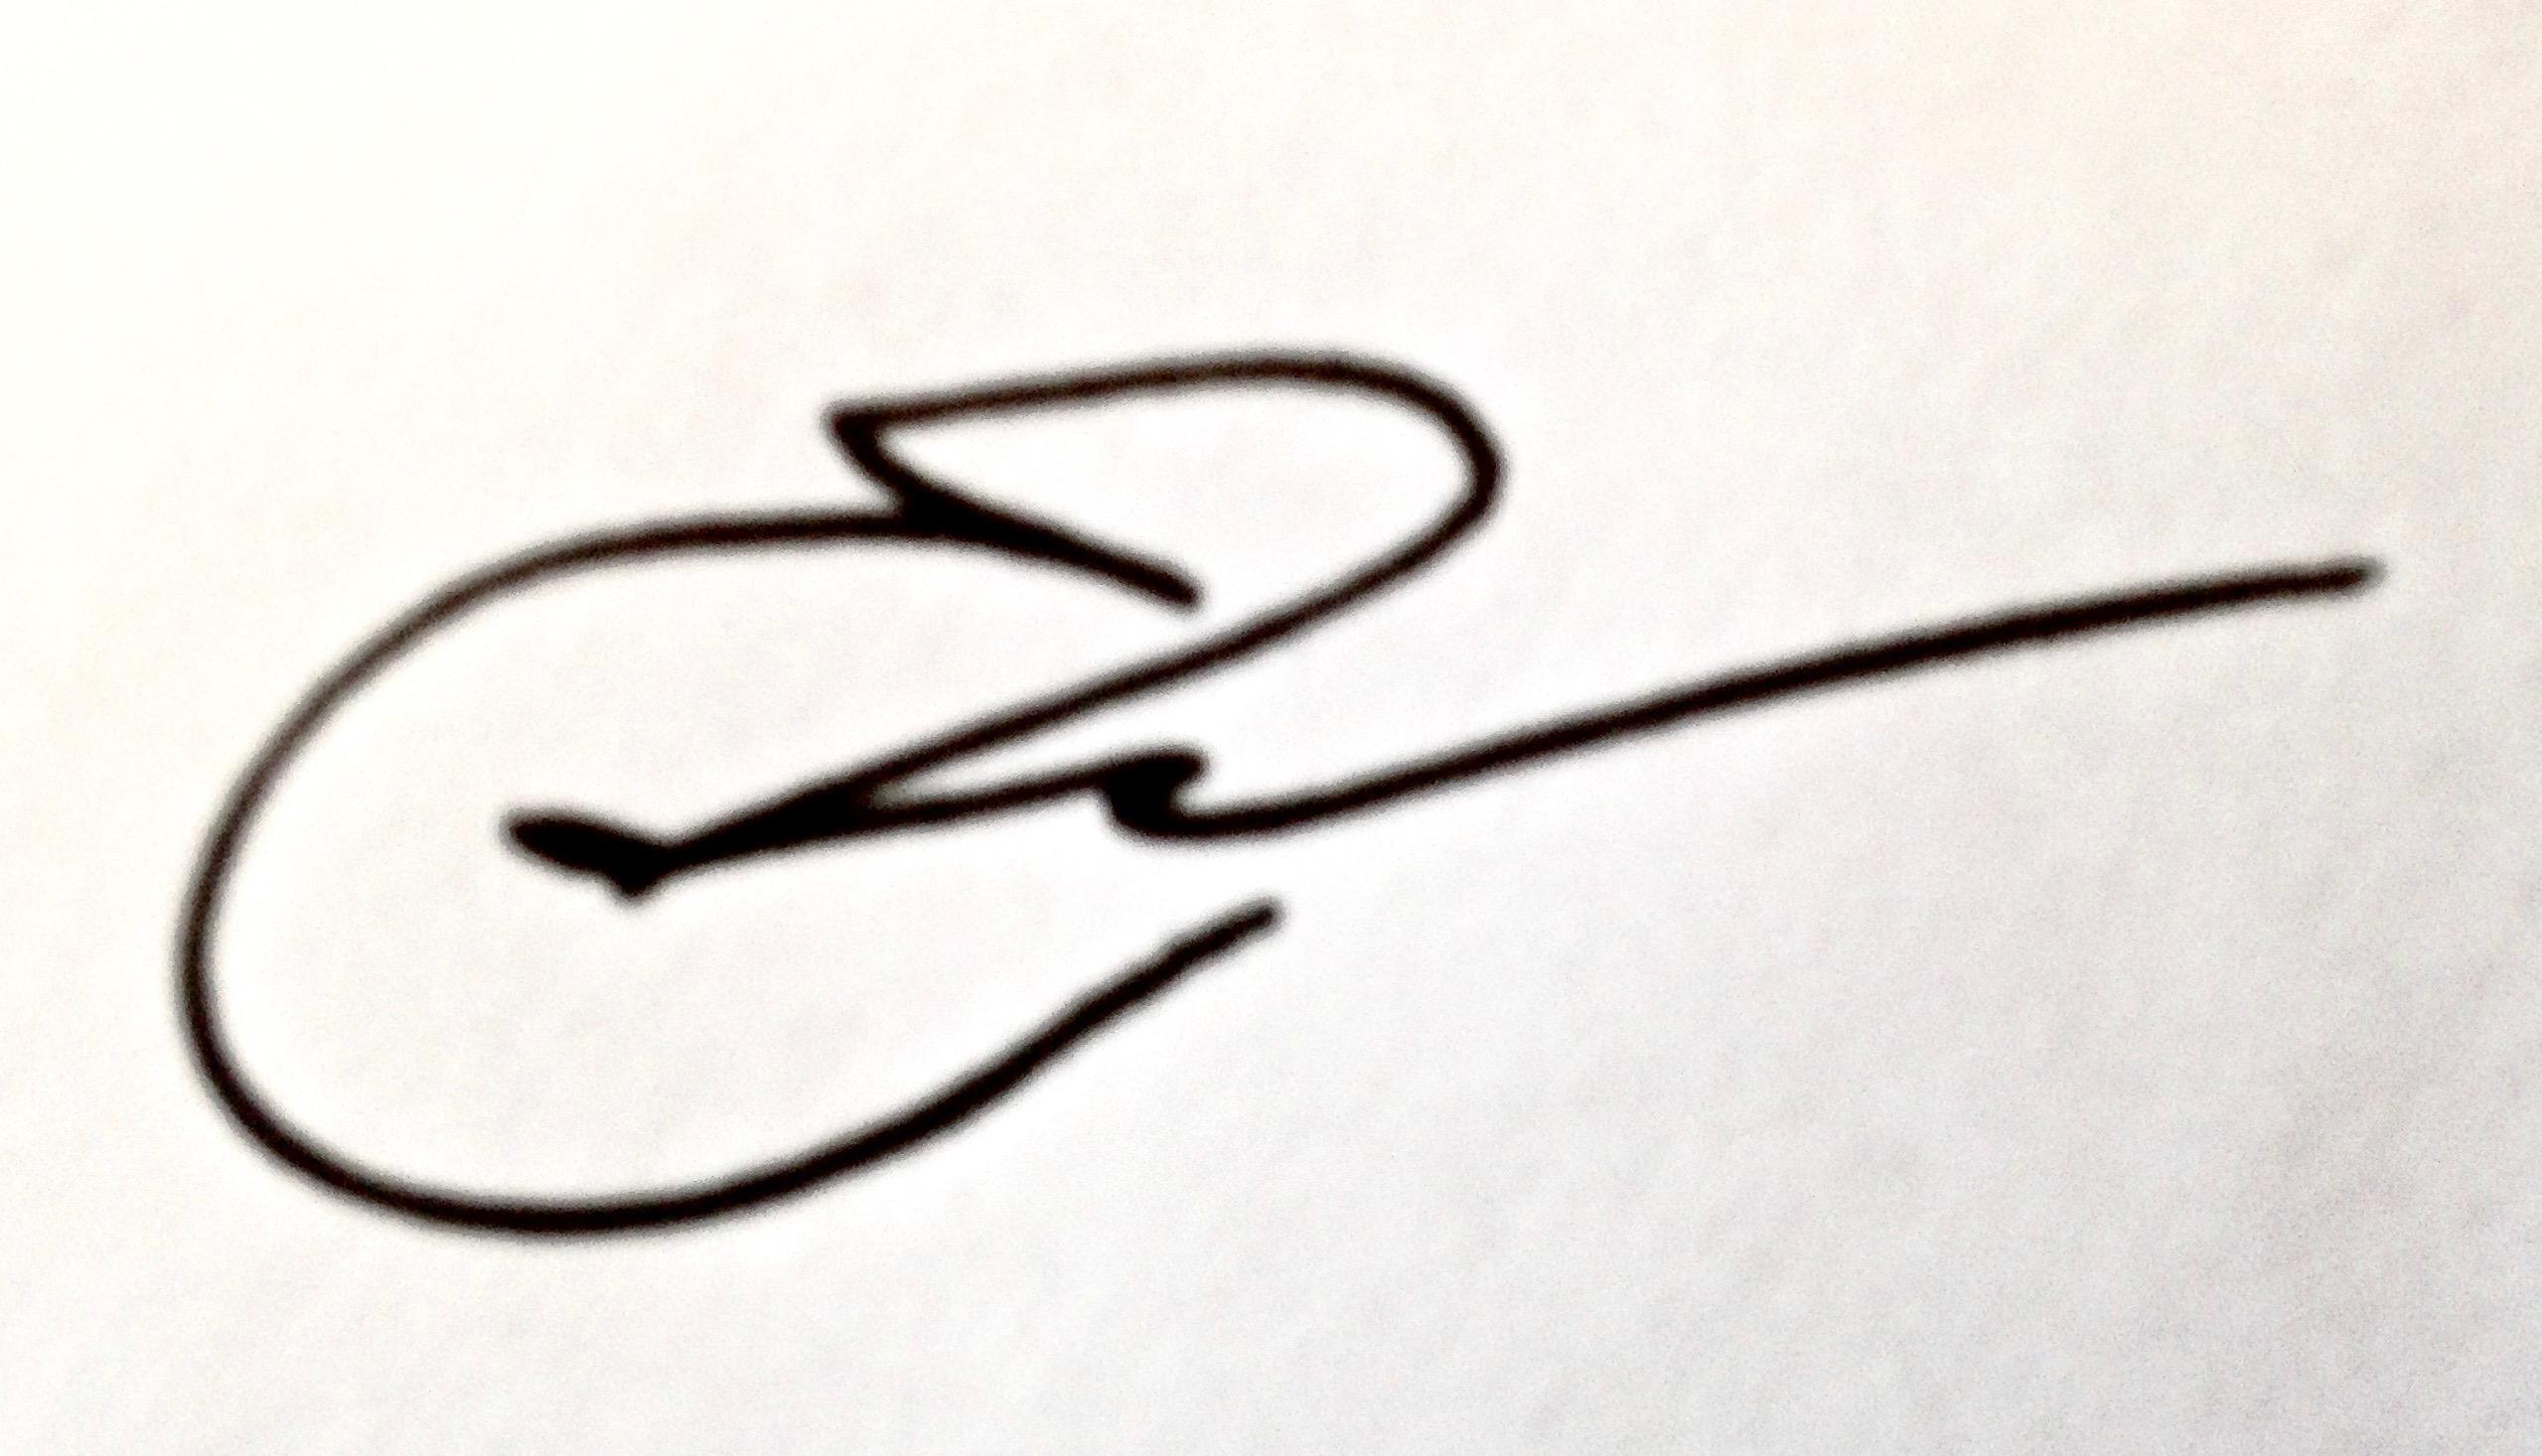 Eran Fraenkel's Signature